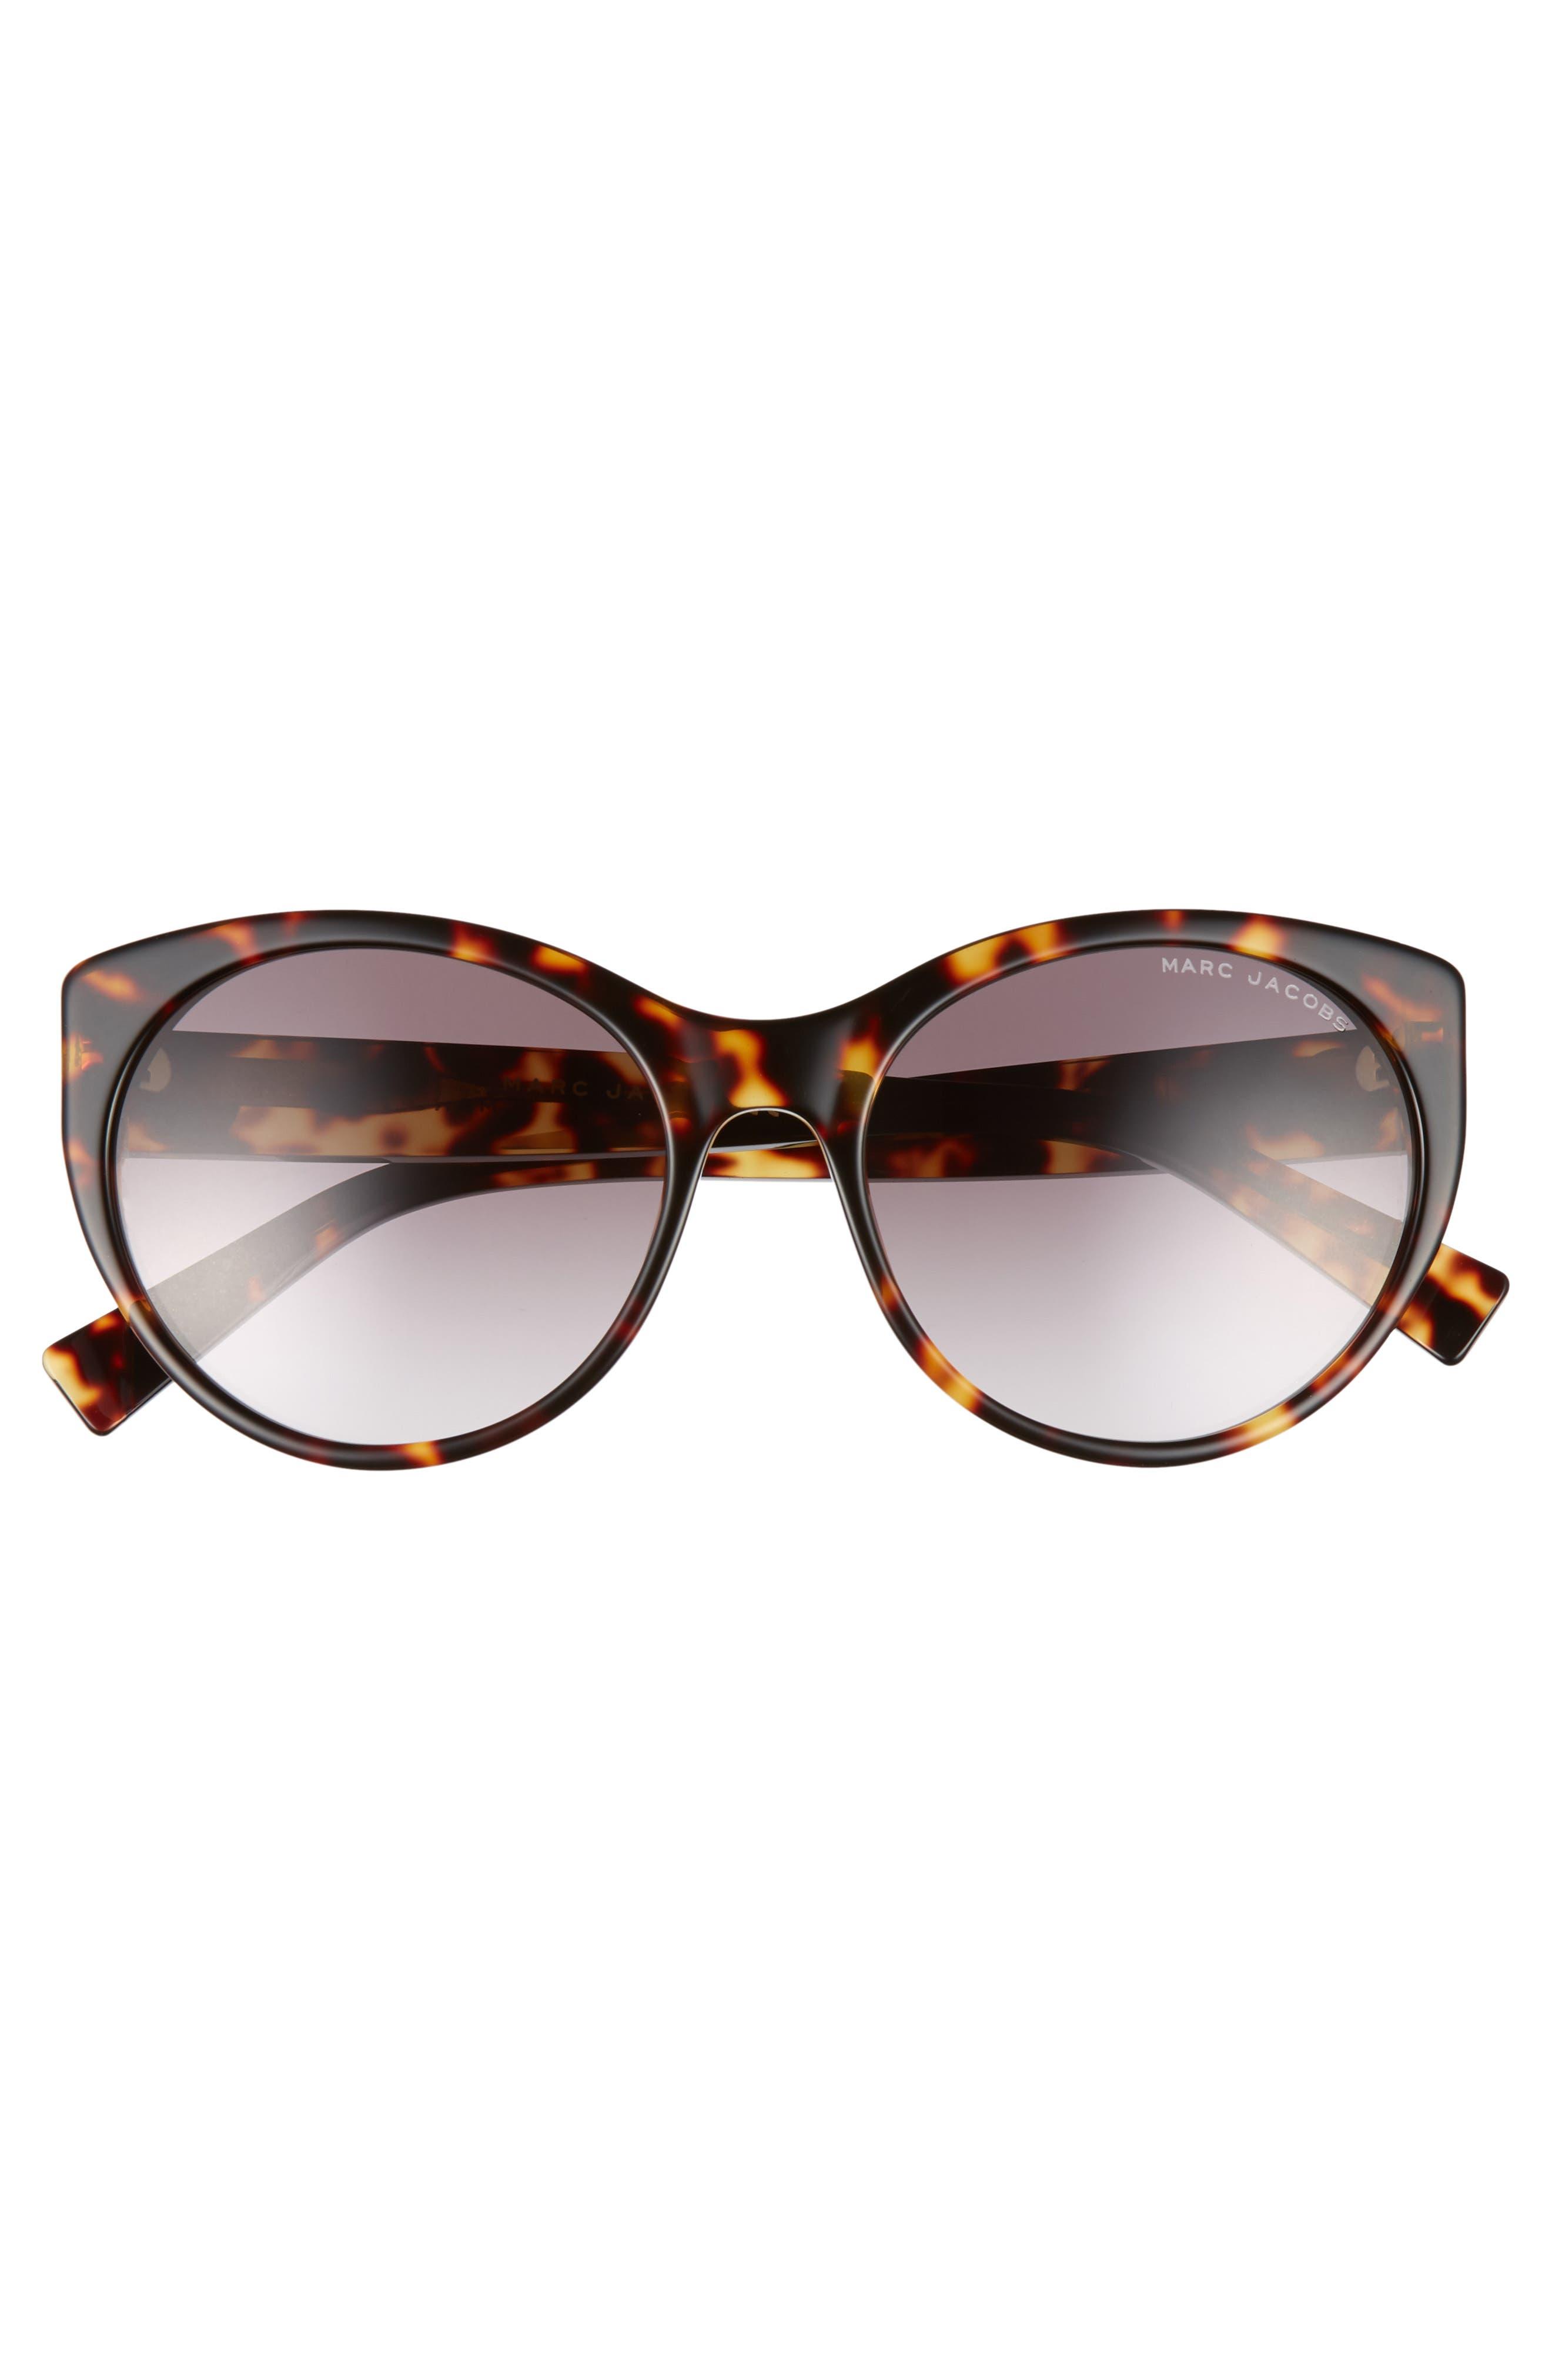 MARC JACOBS,                             57mm Round Sunglasses,                             Alternate thumbnail 3, color,                             BLACK DARK HAVANA